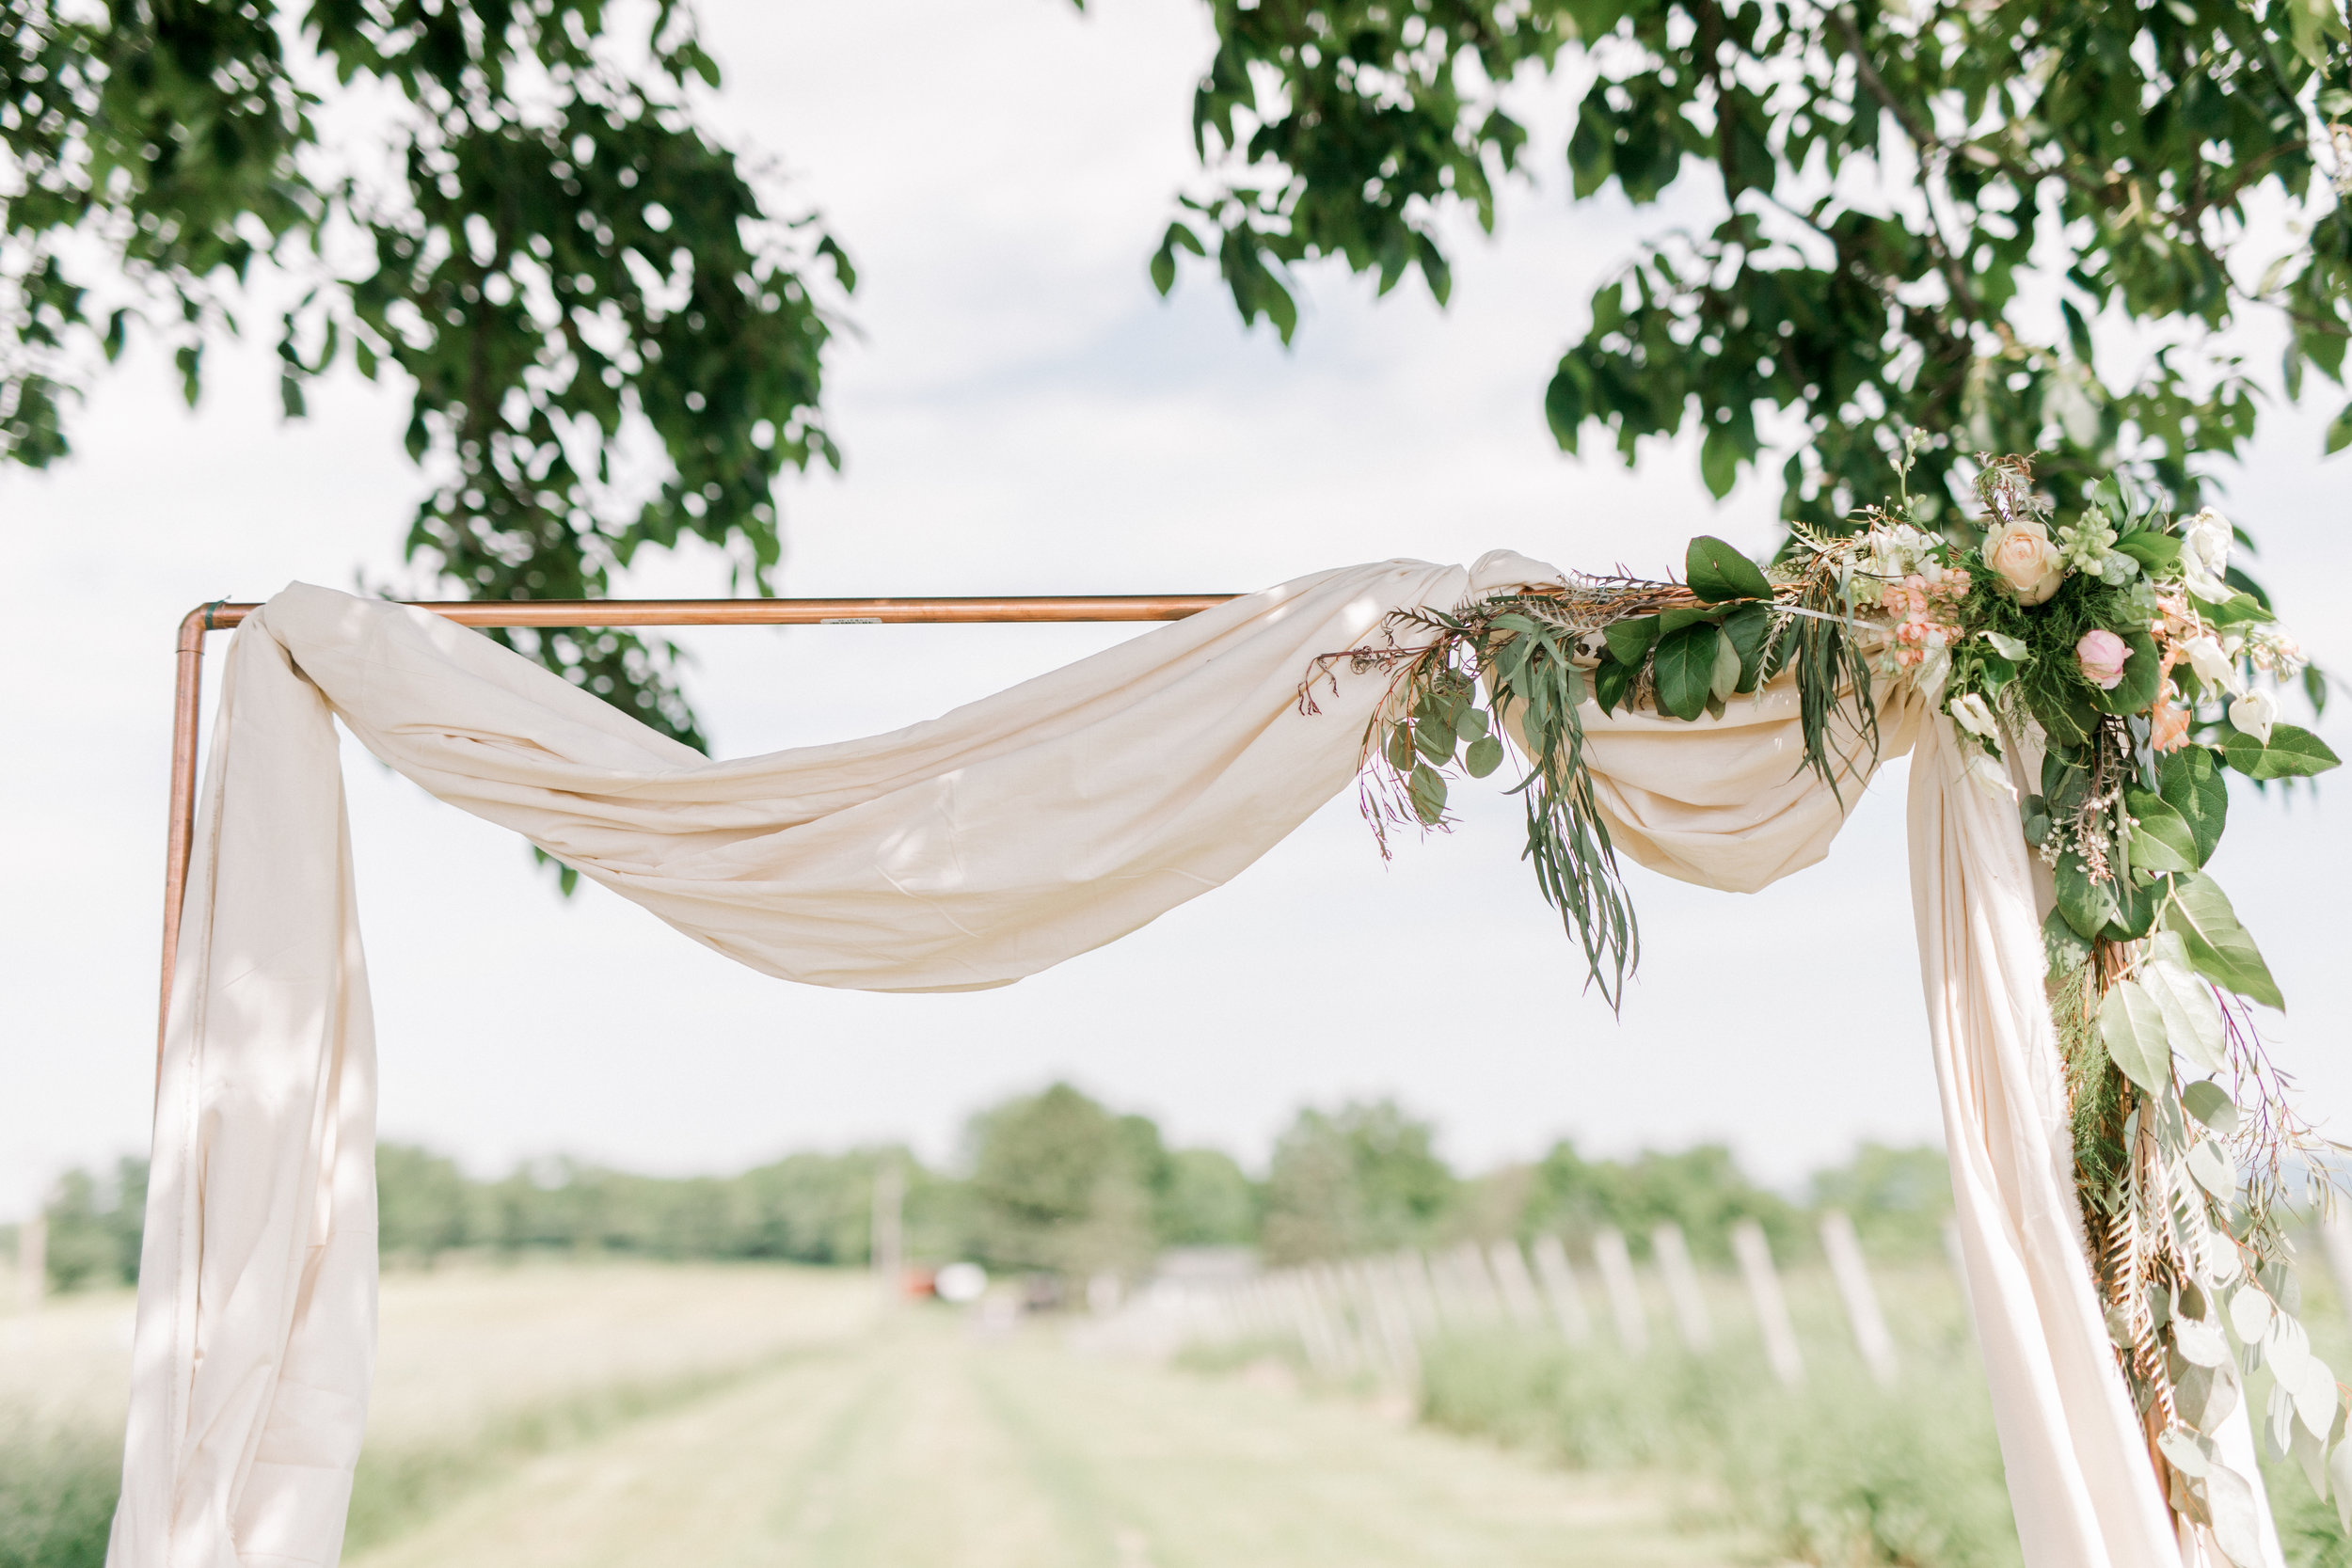 haley-richter-photography-summer-vineyard-wedding-boho-ceremony-arch-copper-blush-cloth-greenery-simple-elegant-rustic